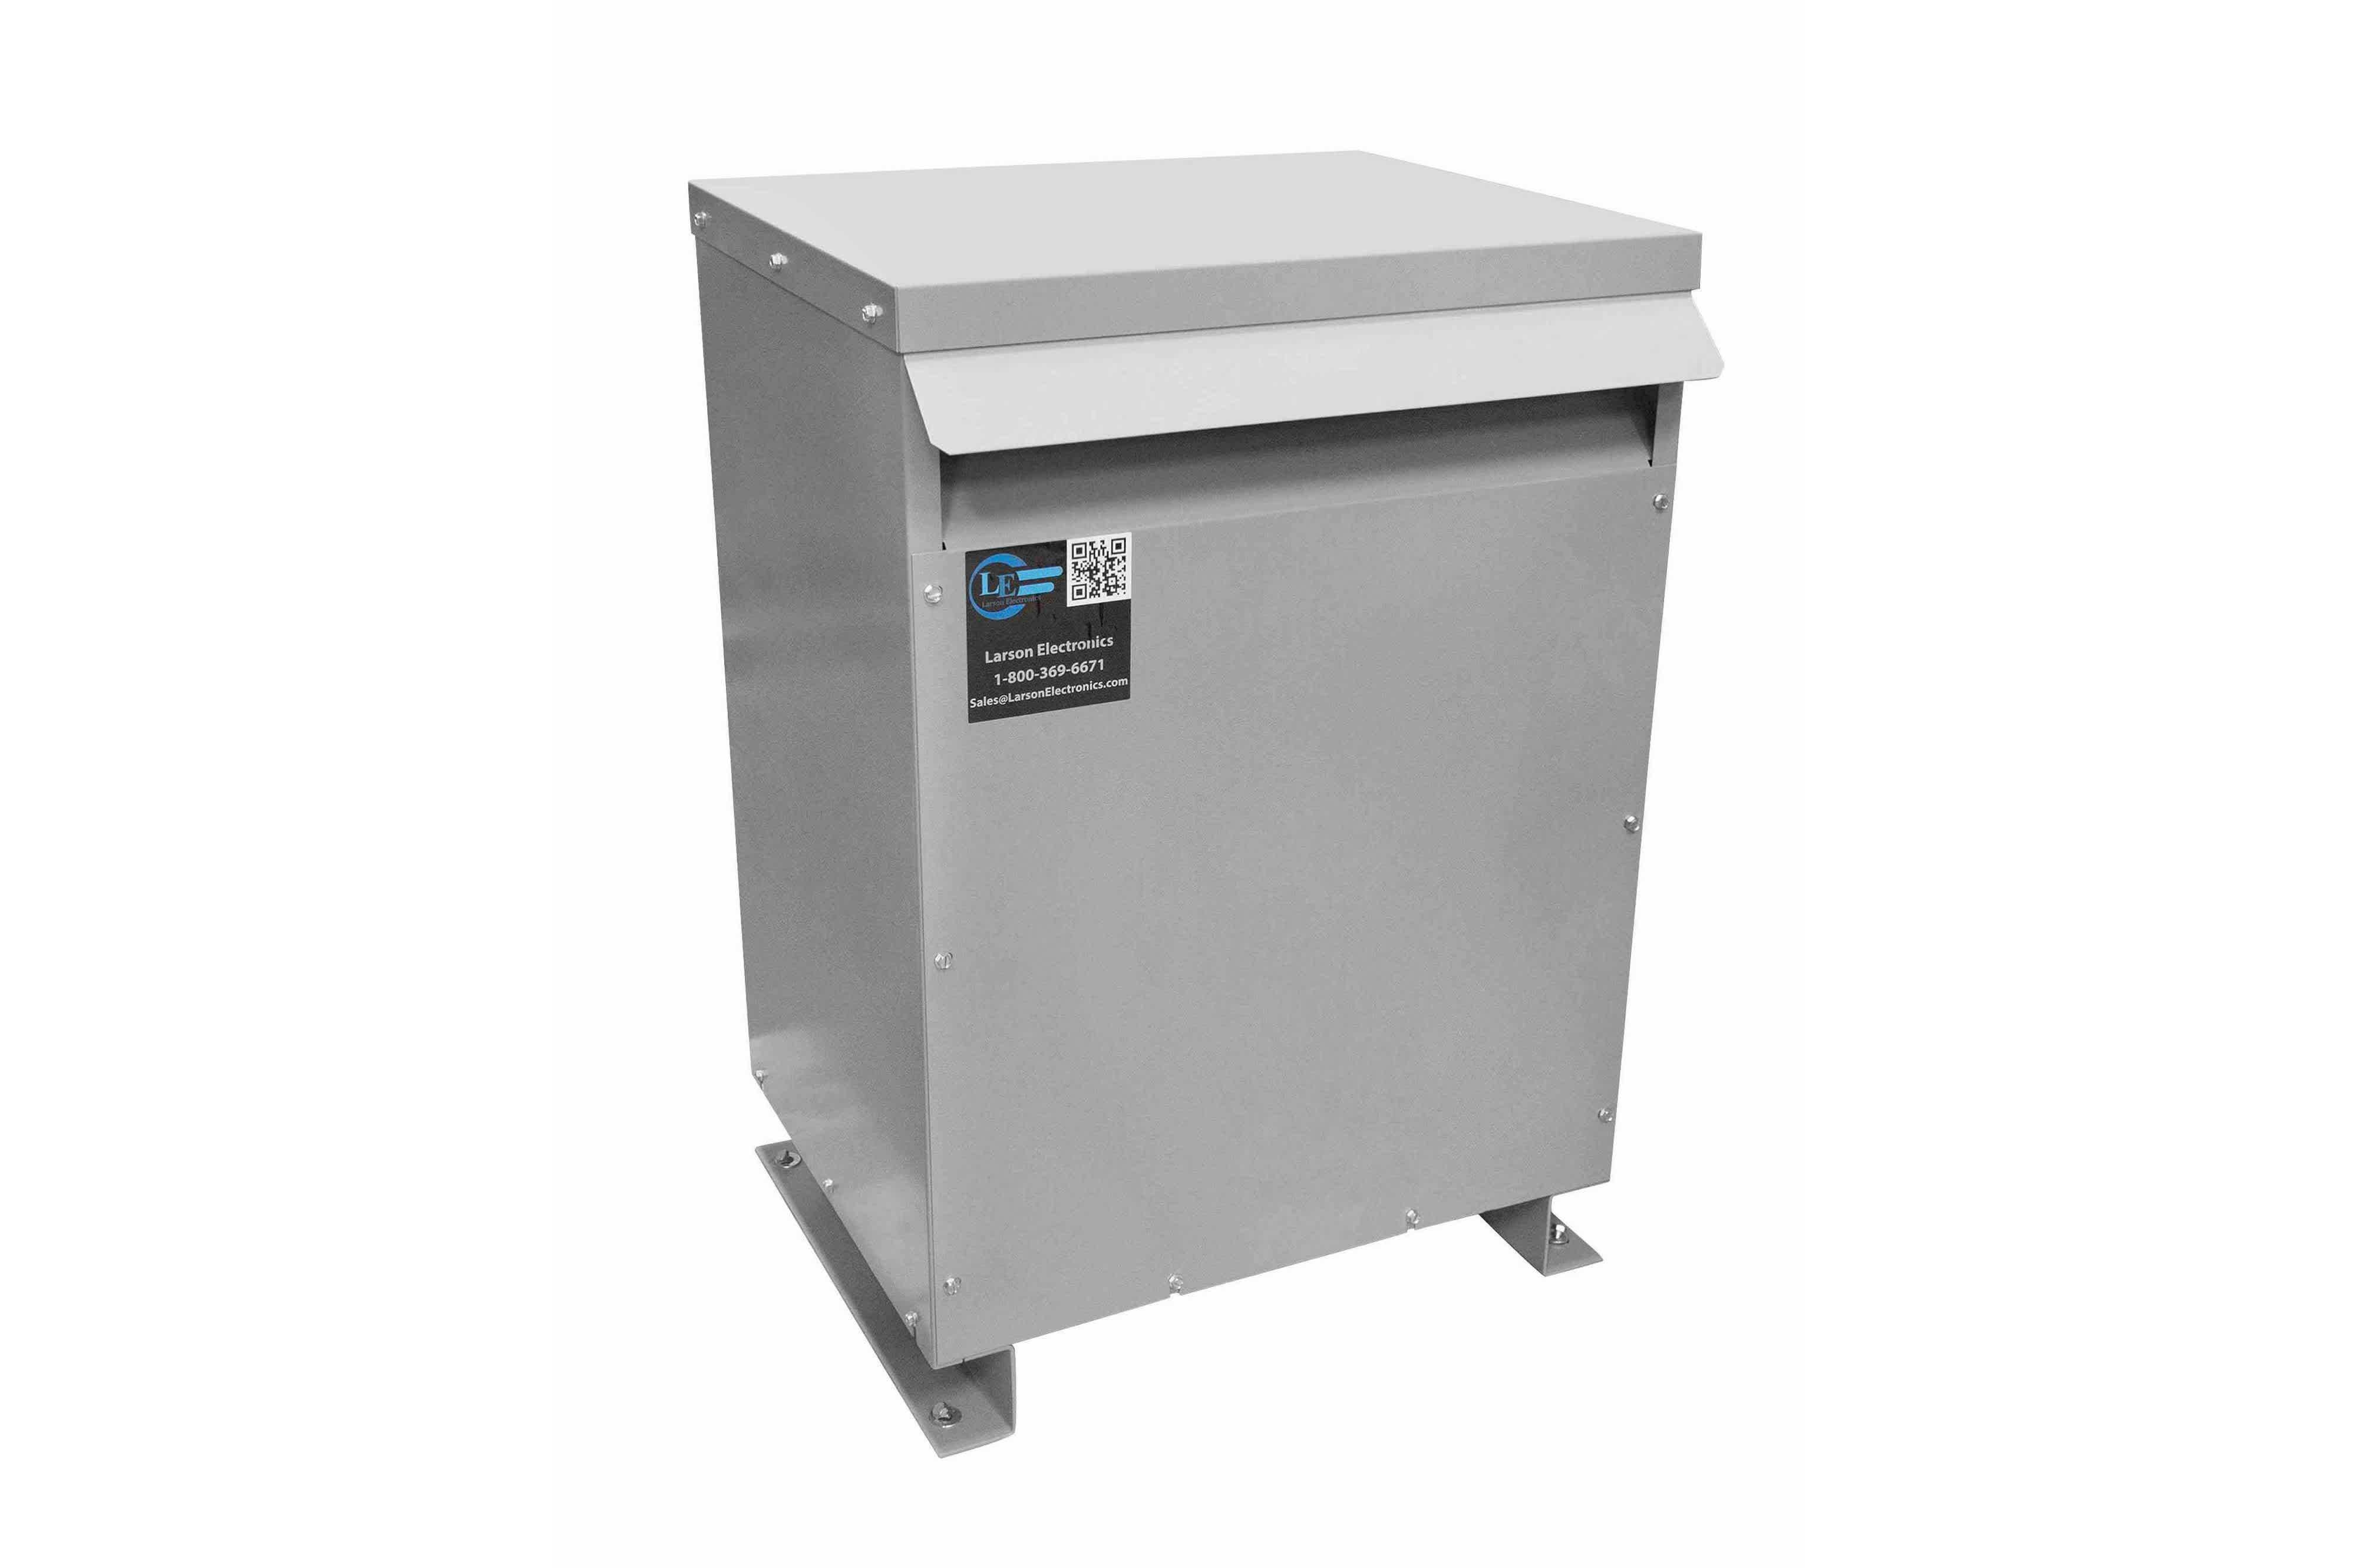 167 kVA 3PH DOE Transformer, 480V Delta Primary, 575Y/332 Wye-N Secondary, N3R, Ventilated, 60 Hz